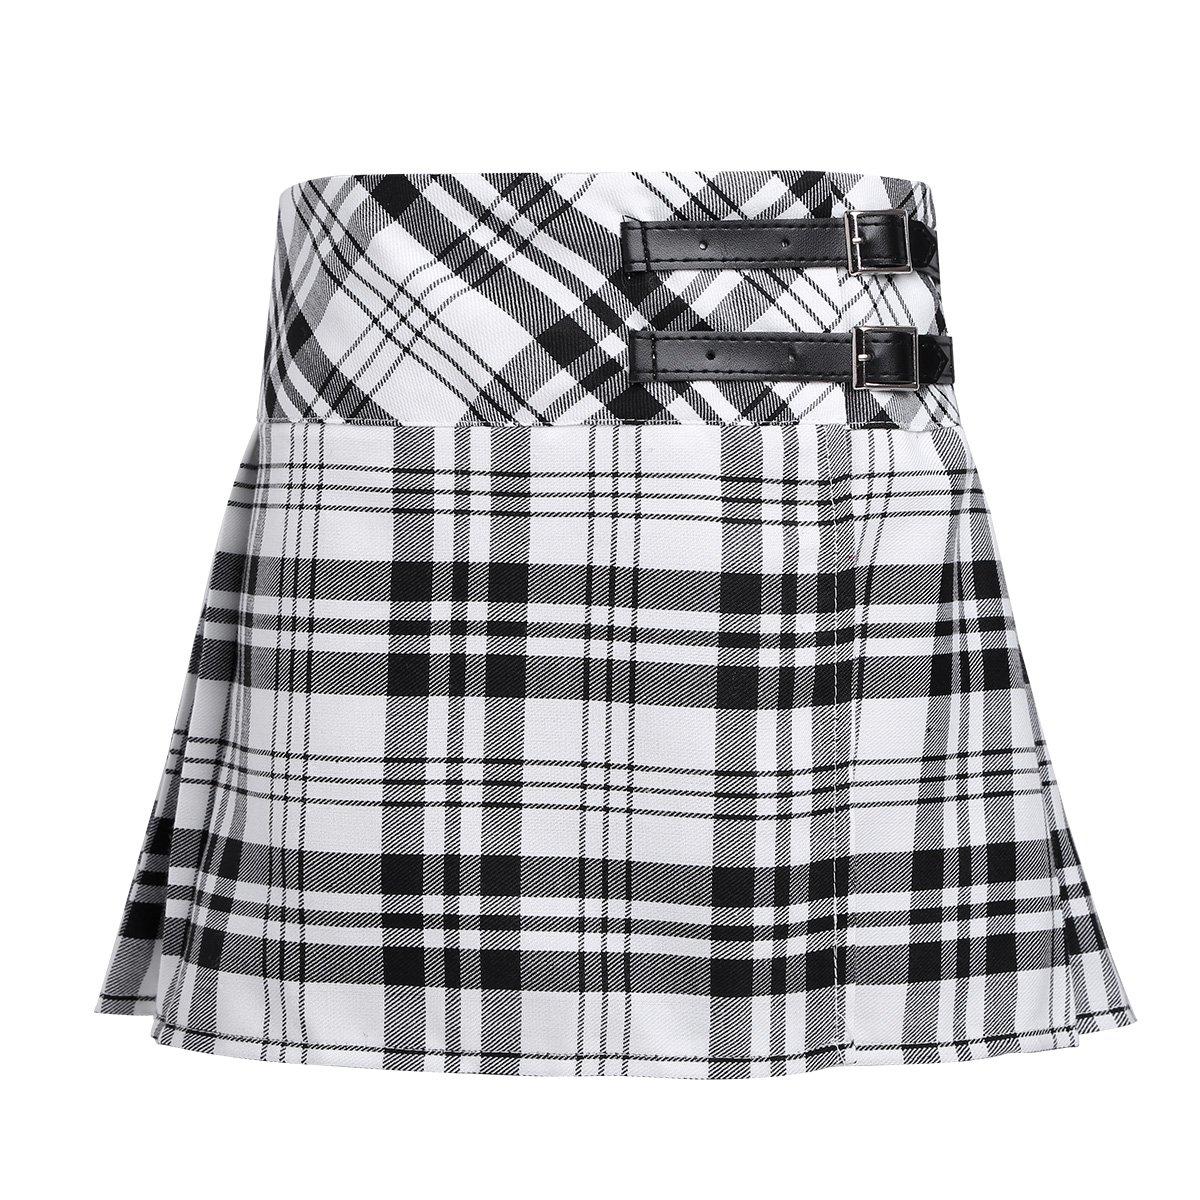 Freebily Girls Tartan Pleated Billie Kilt Miniskirt Classical School Uniforms Skirts Black&White 6